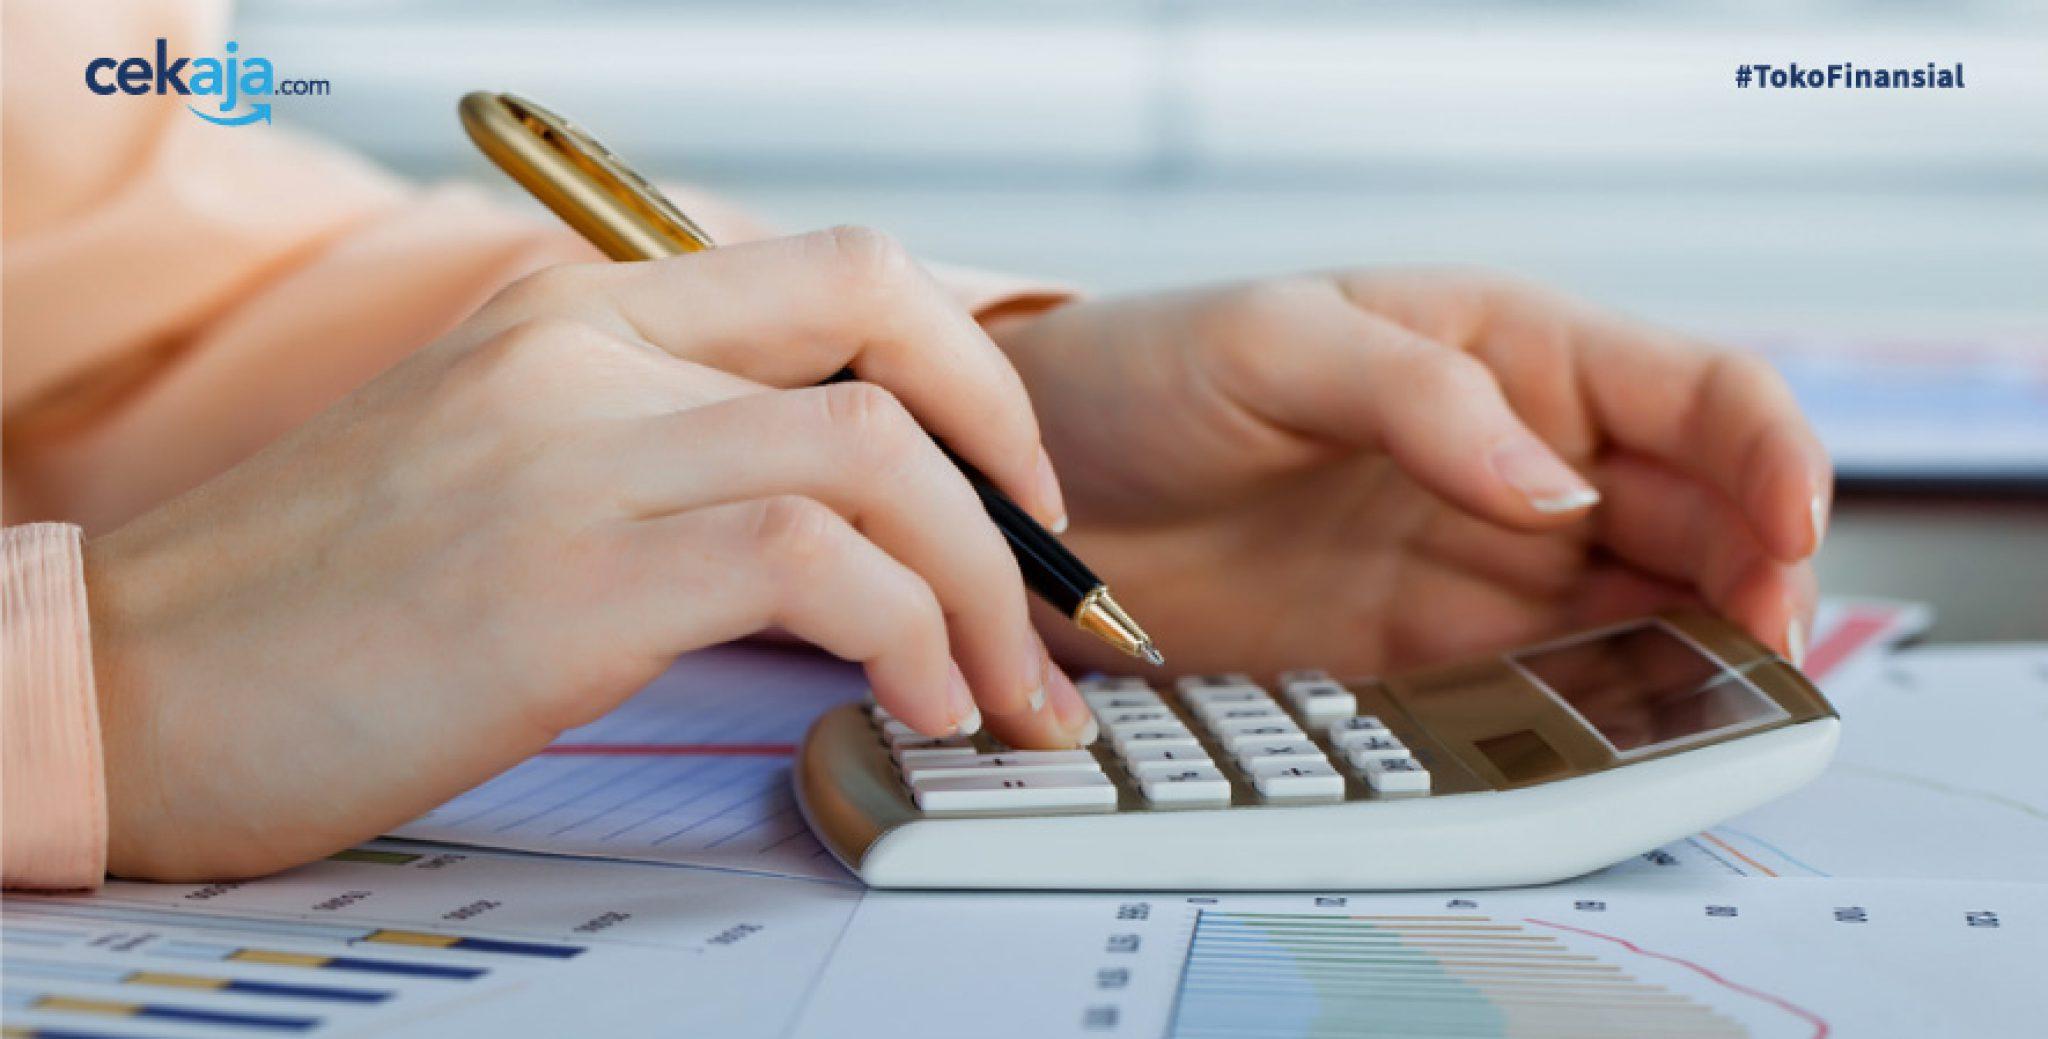 tips hemat _ kartu kredit - CekAja.com